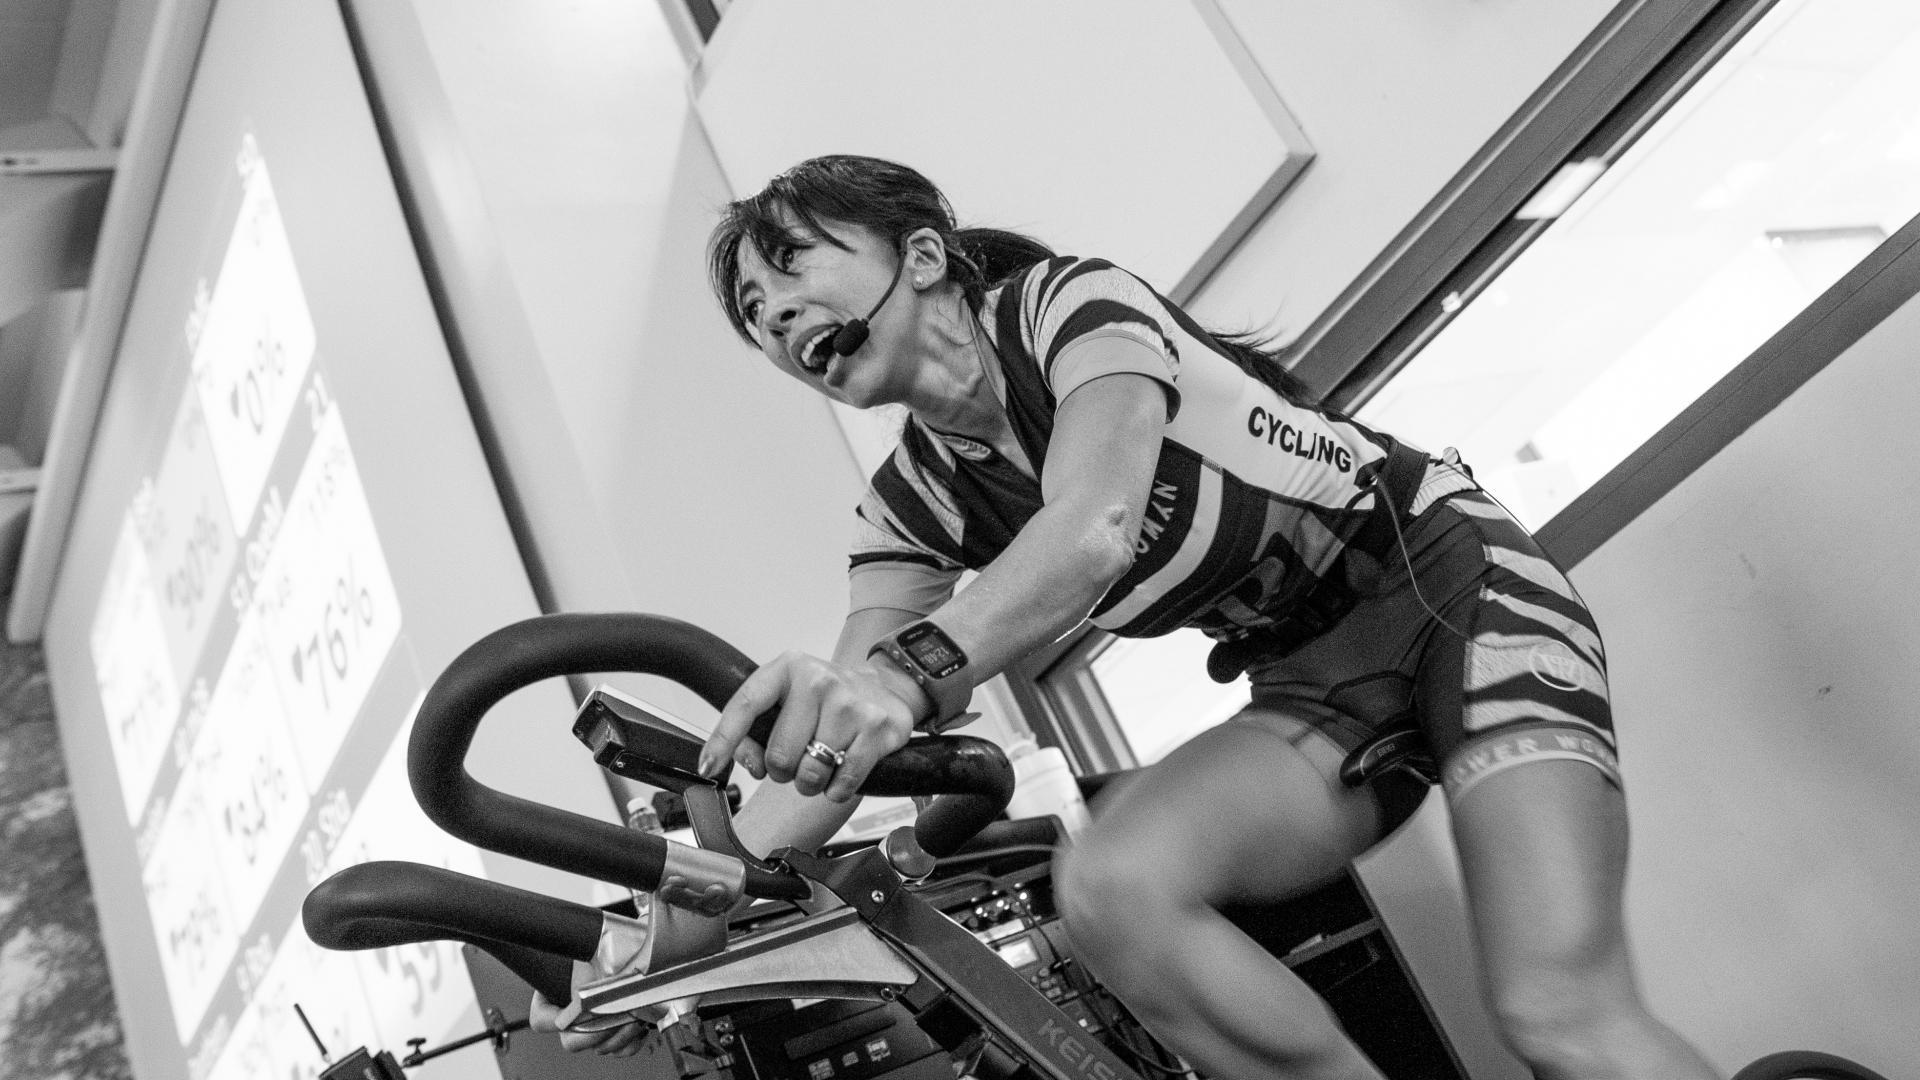 Spinning Trainerin